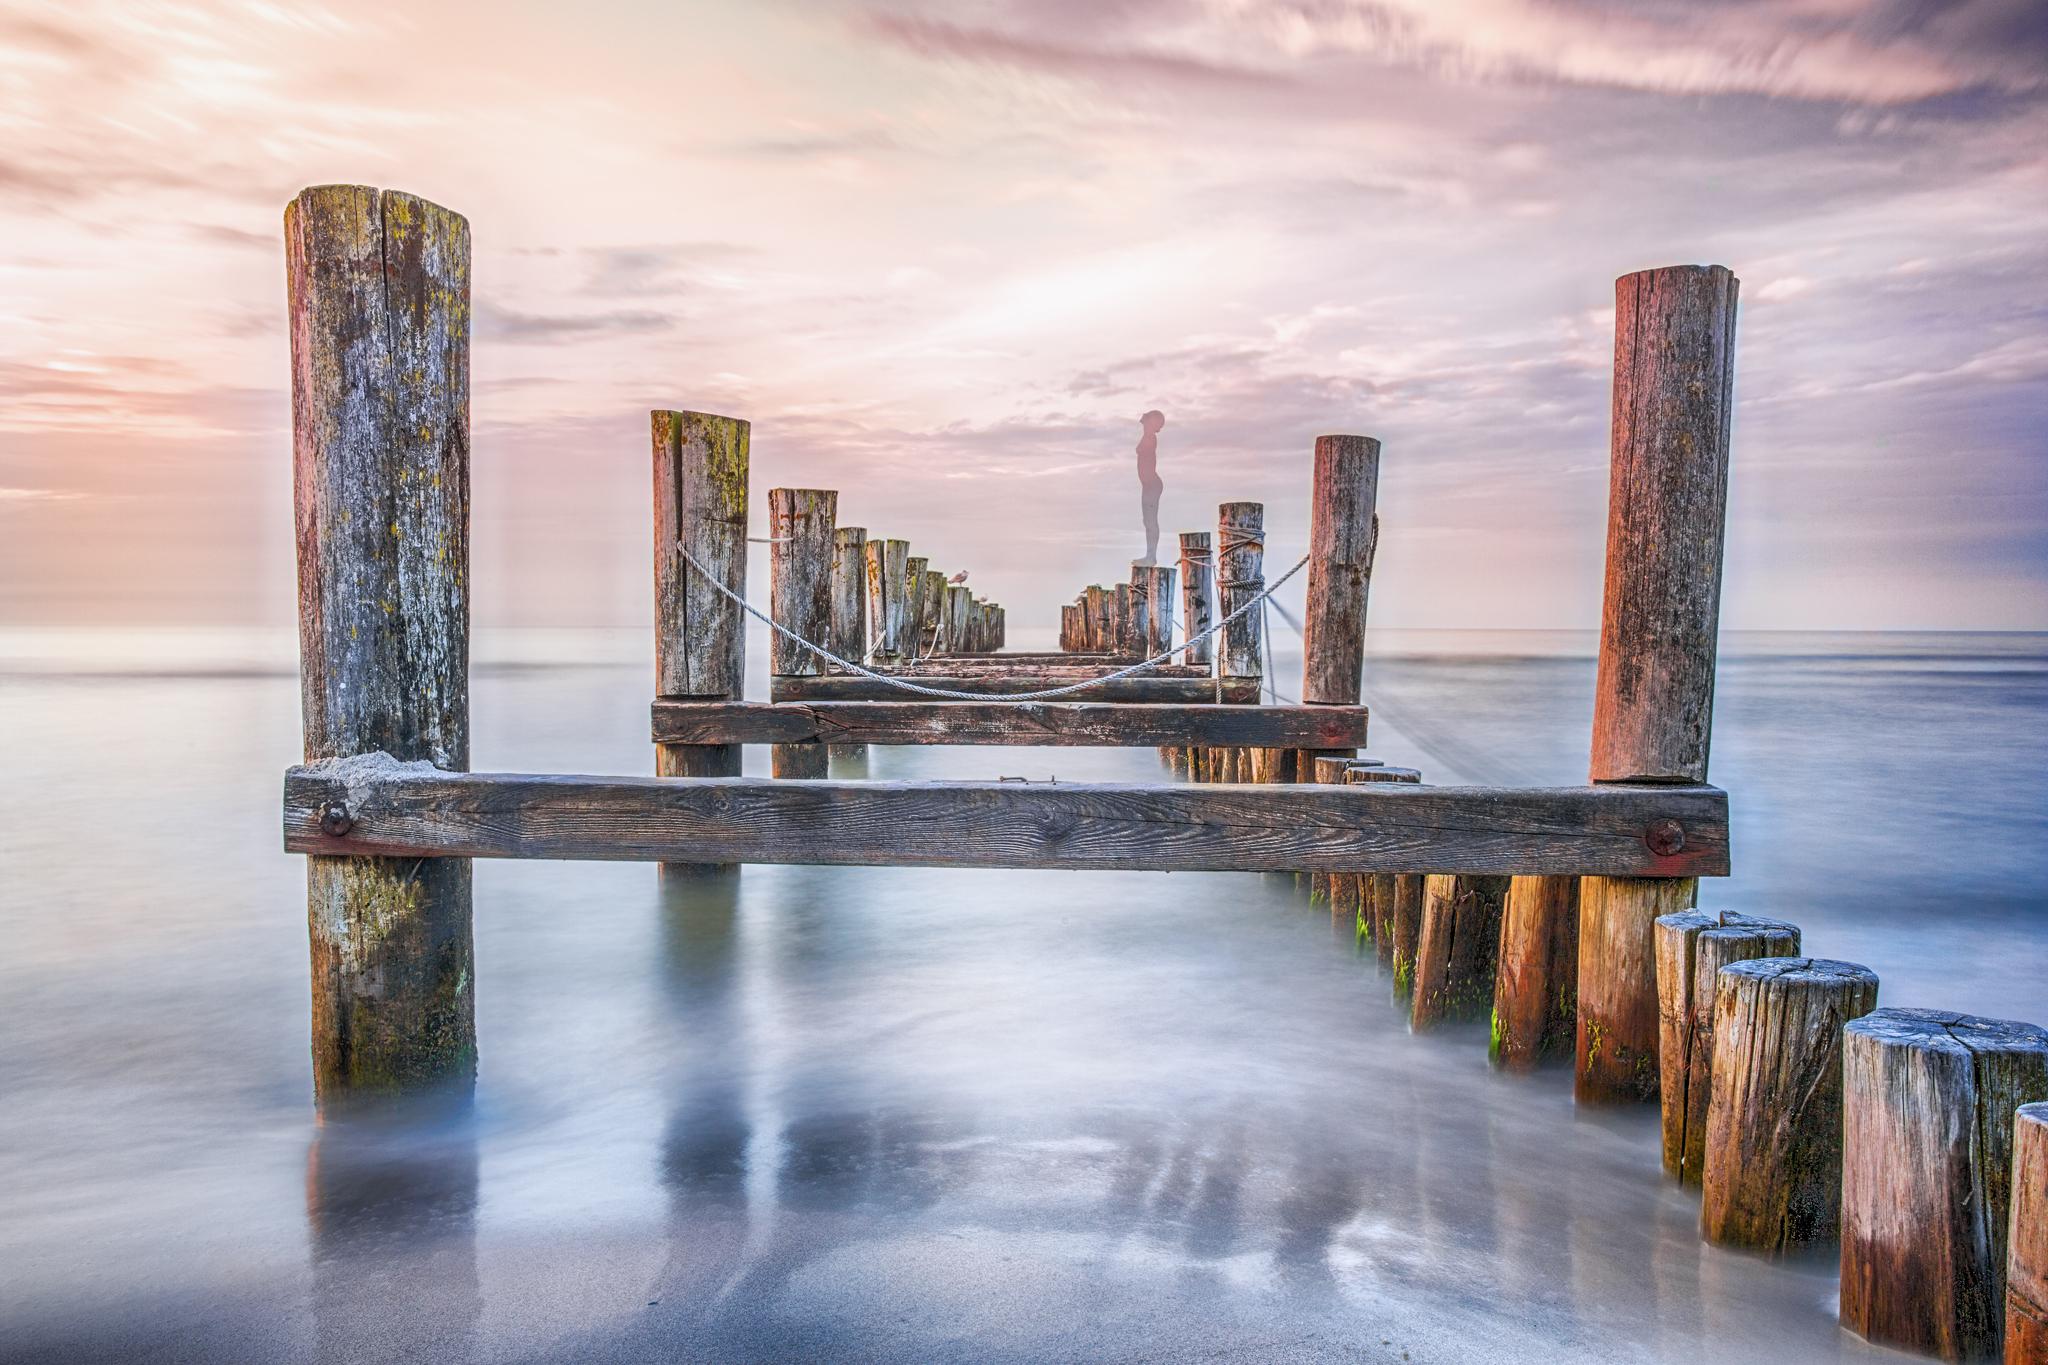 Old jetty, Zingst, Germany